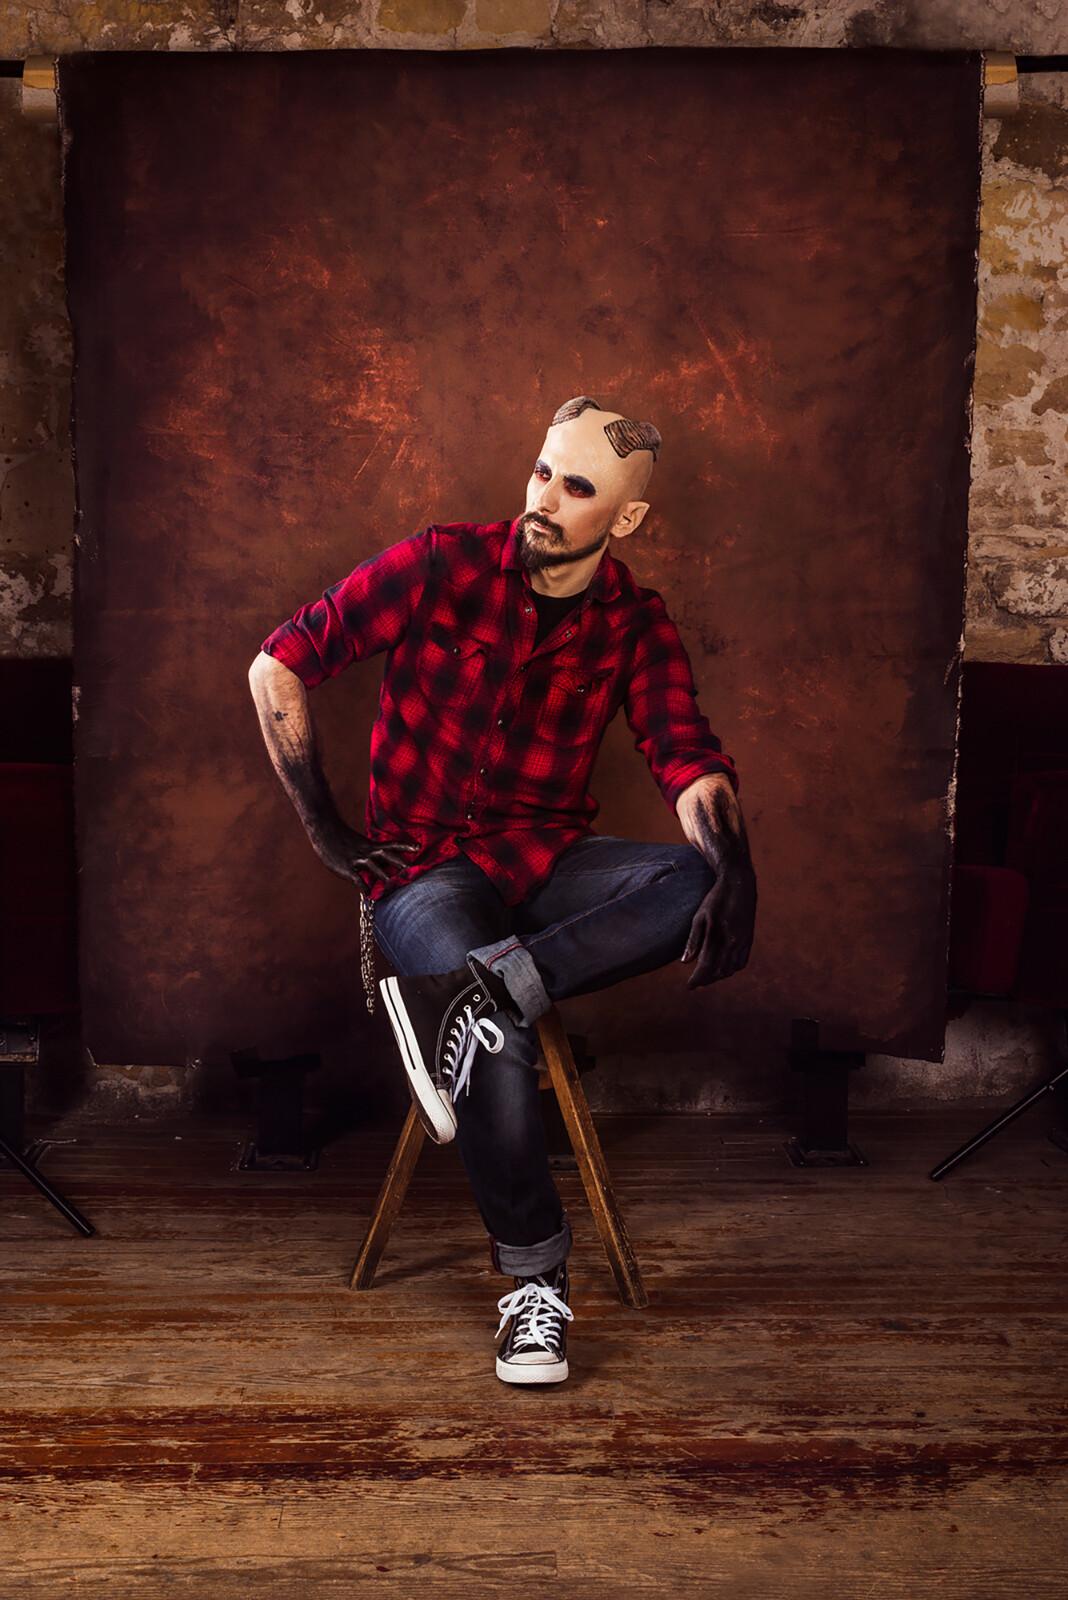 Model : Arlequin Propsmaker Photography : Antony Gomes Light Assistant : Florian Fromentin  Decors and props director: Arlequin Workshop Art directors : Koni / Antony Gomes